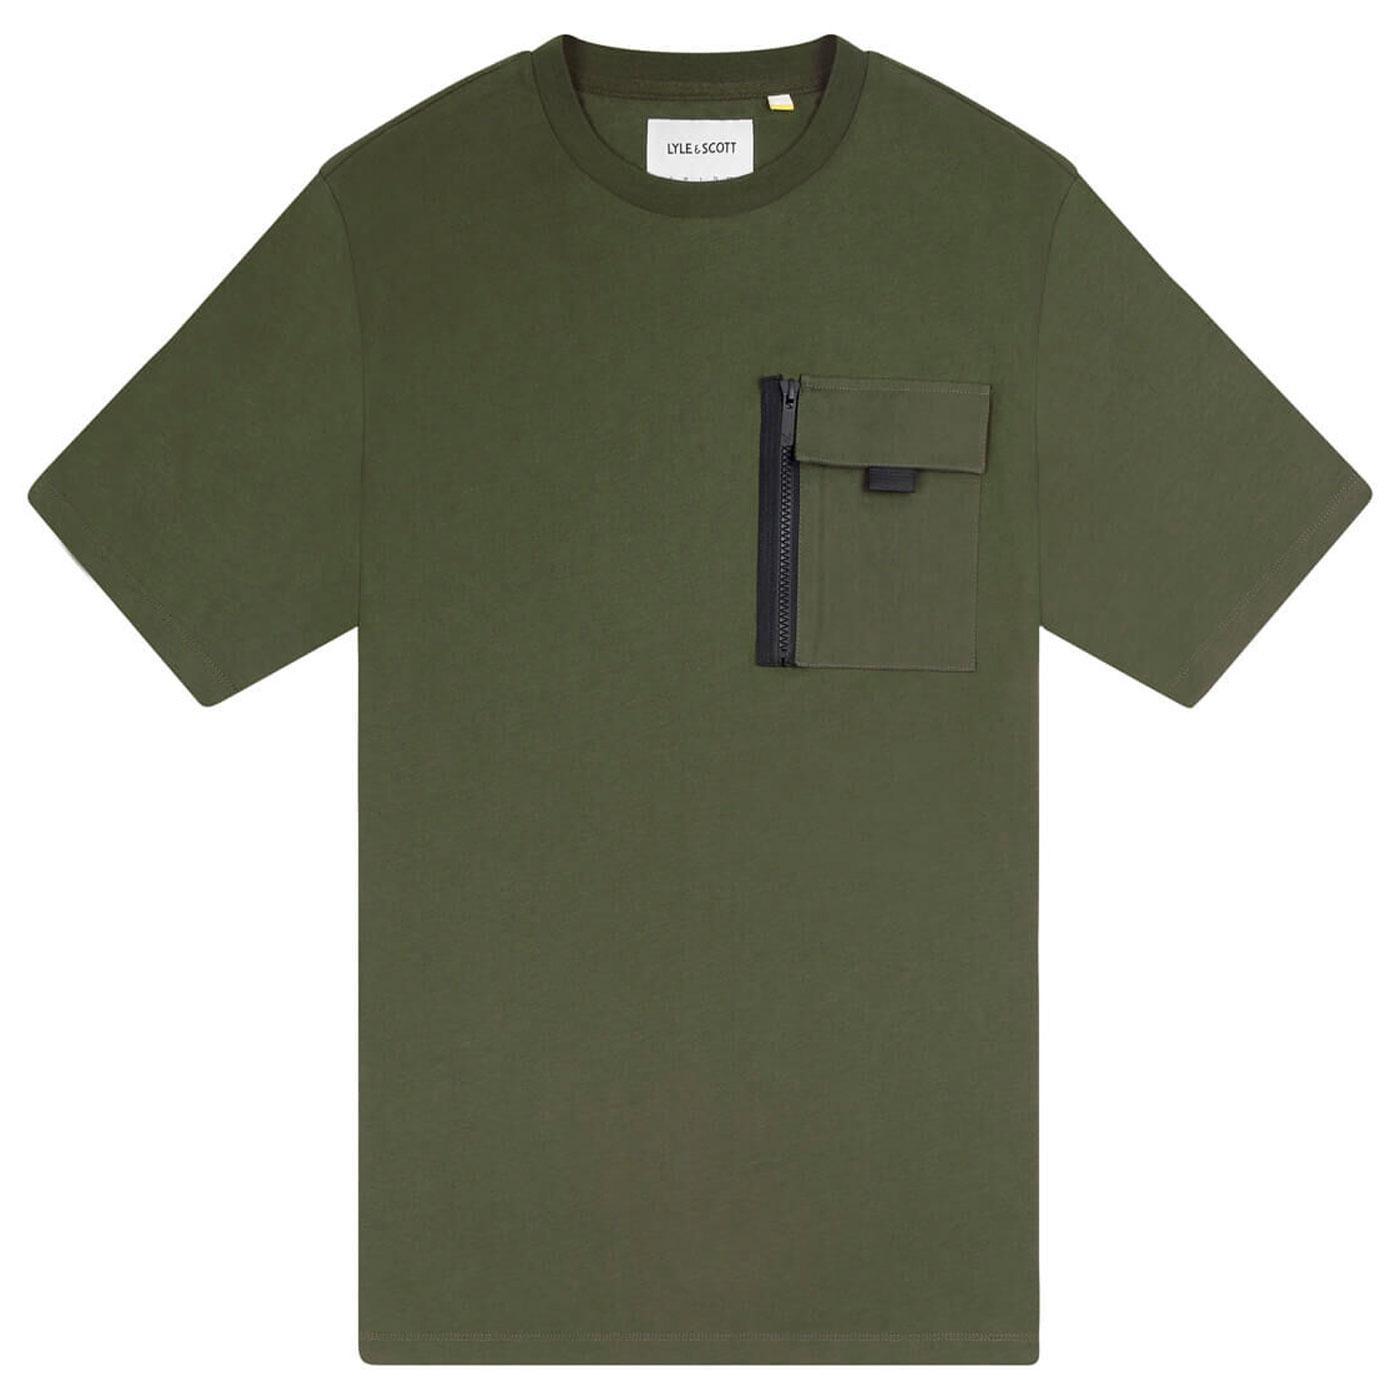 LYLE & SCOTT Mod Casuals Retro 80s Zip Pocket Tee